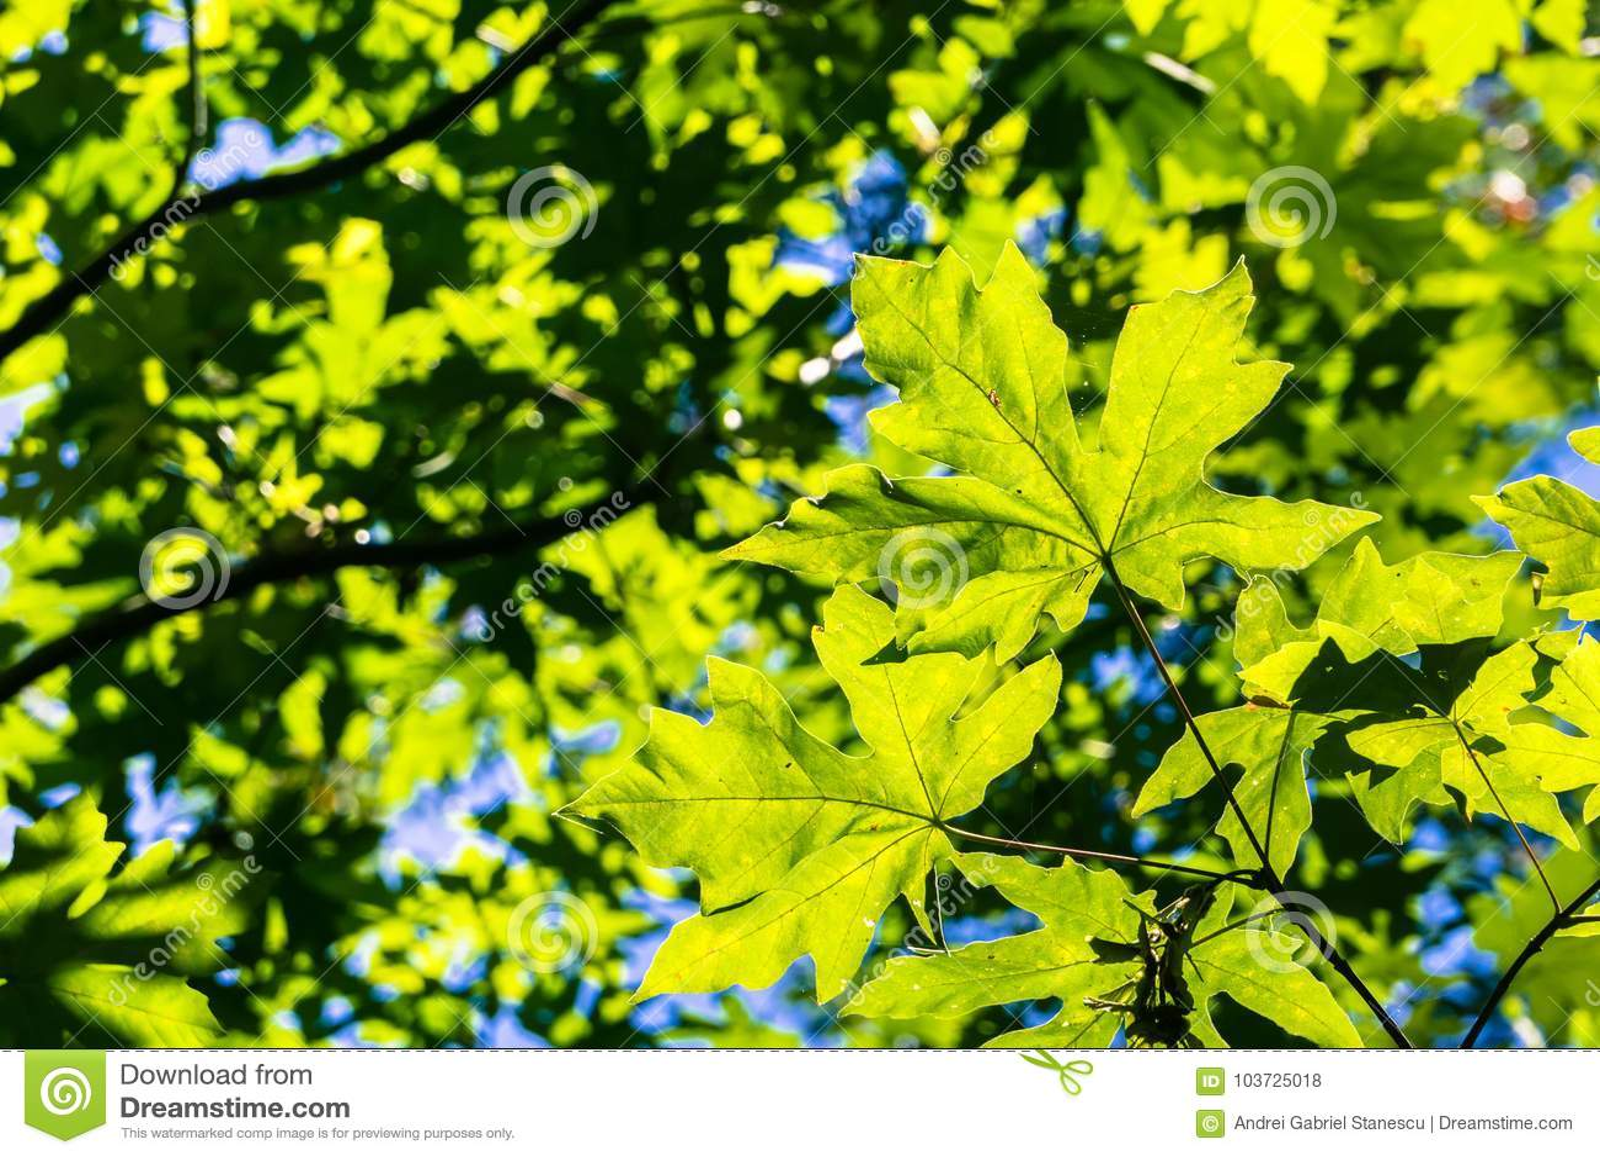 Verdant Green Bigleaf Maple Acer Macrophyllum Crown Stock Photo